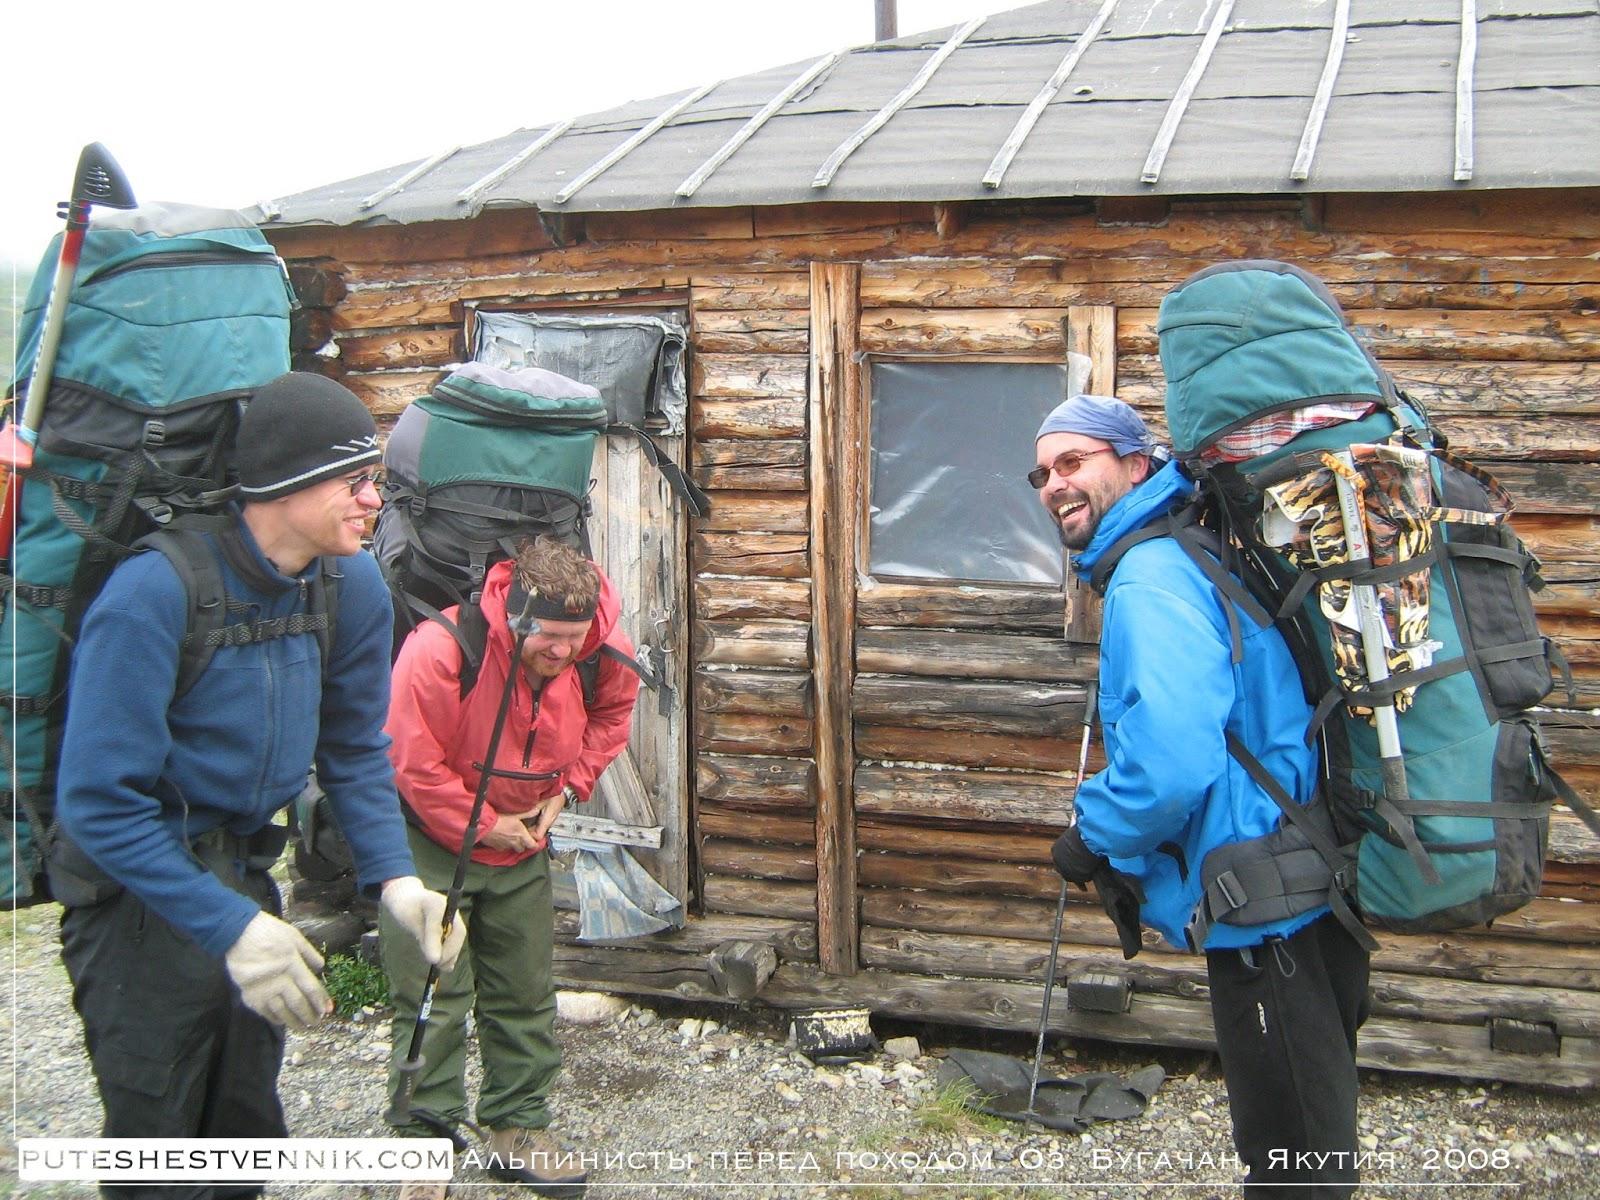 Альпинисты с рюкзаками у избушки